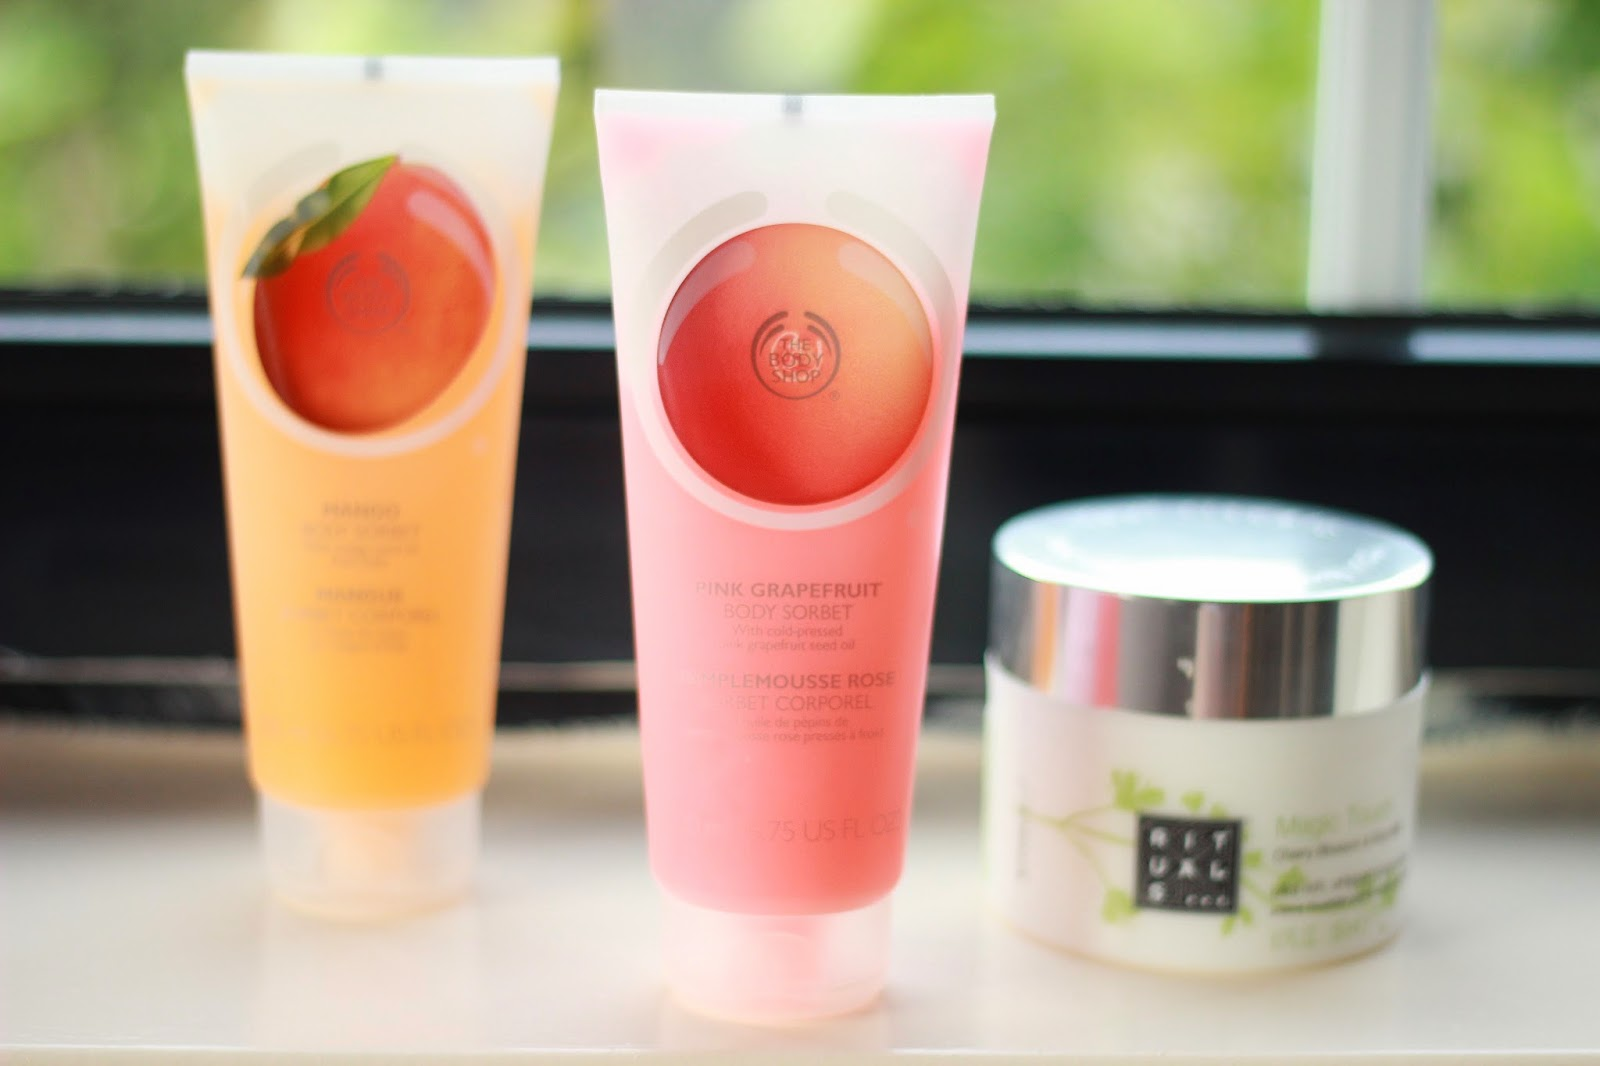 onder de douche, favoriete douche bad beauty producten